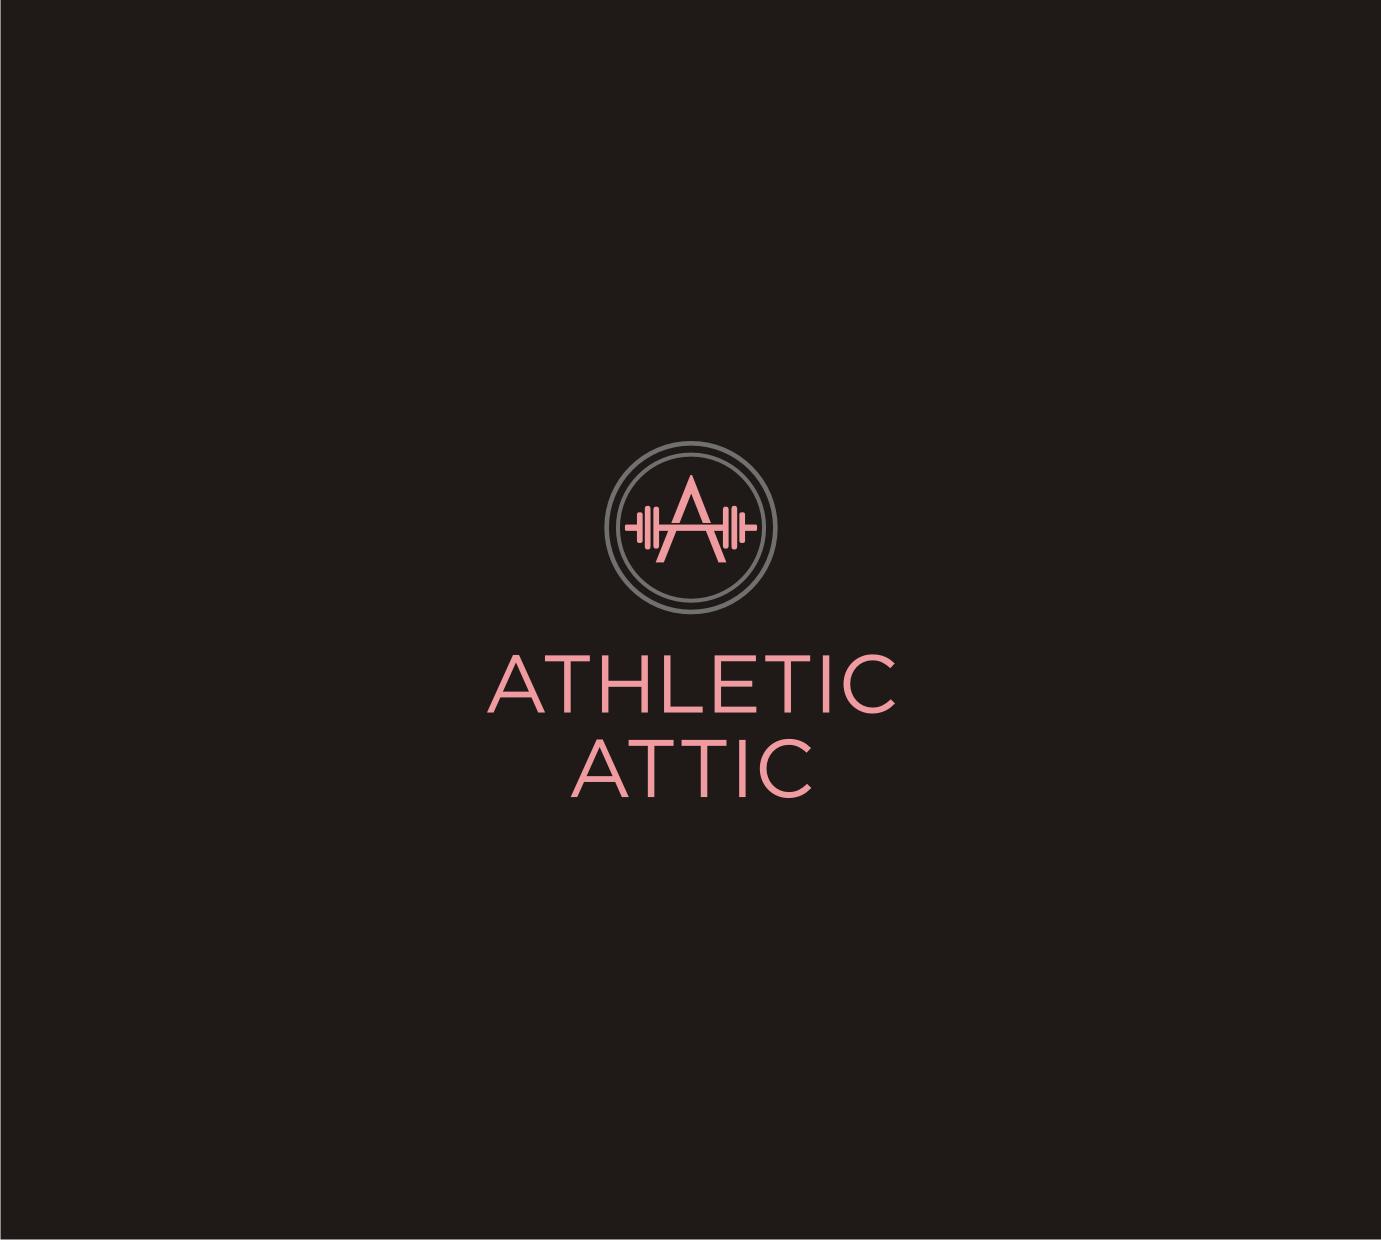 Logo Design by Sigitumarali Sigit - Entry No. 126 in the Logo Design Contest Fun Logo Design for Athletic Attic.